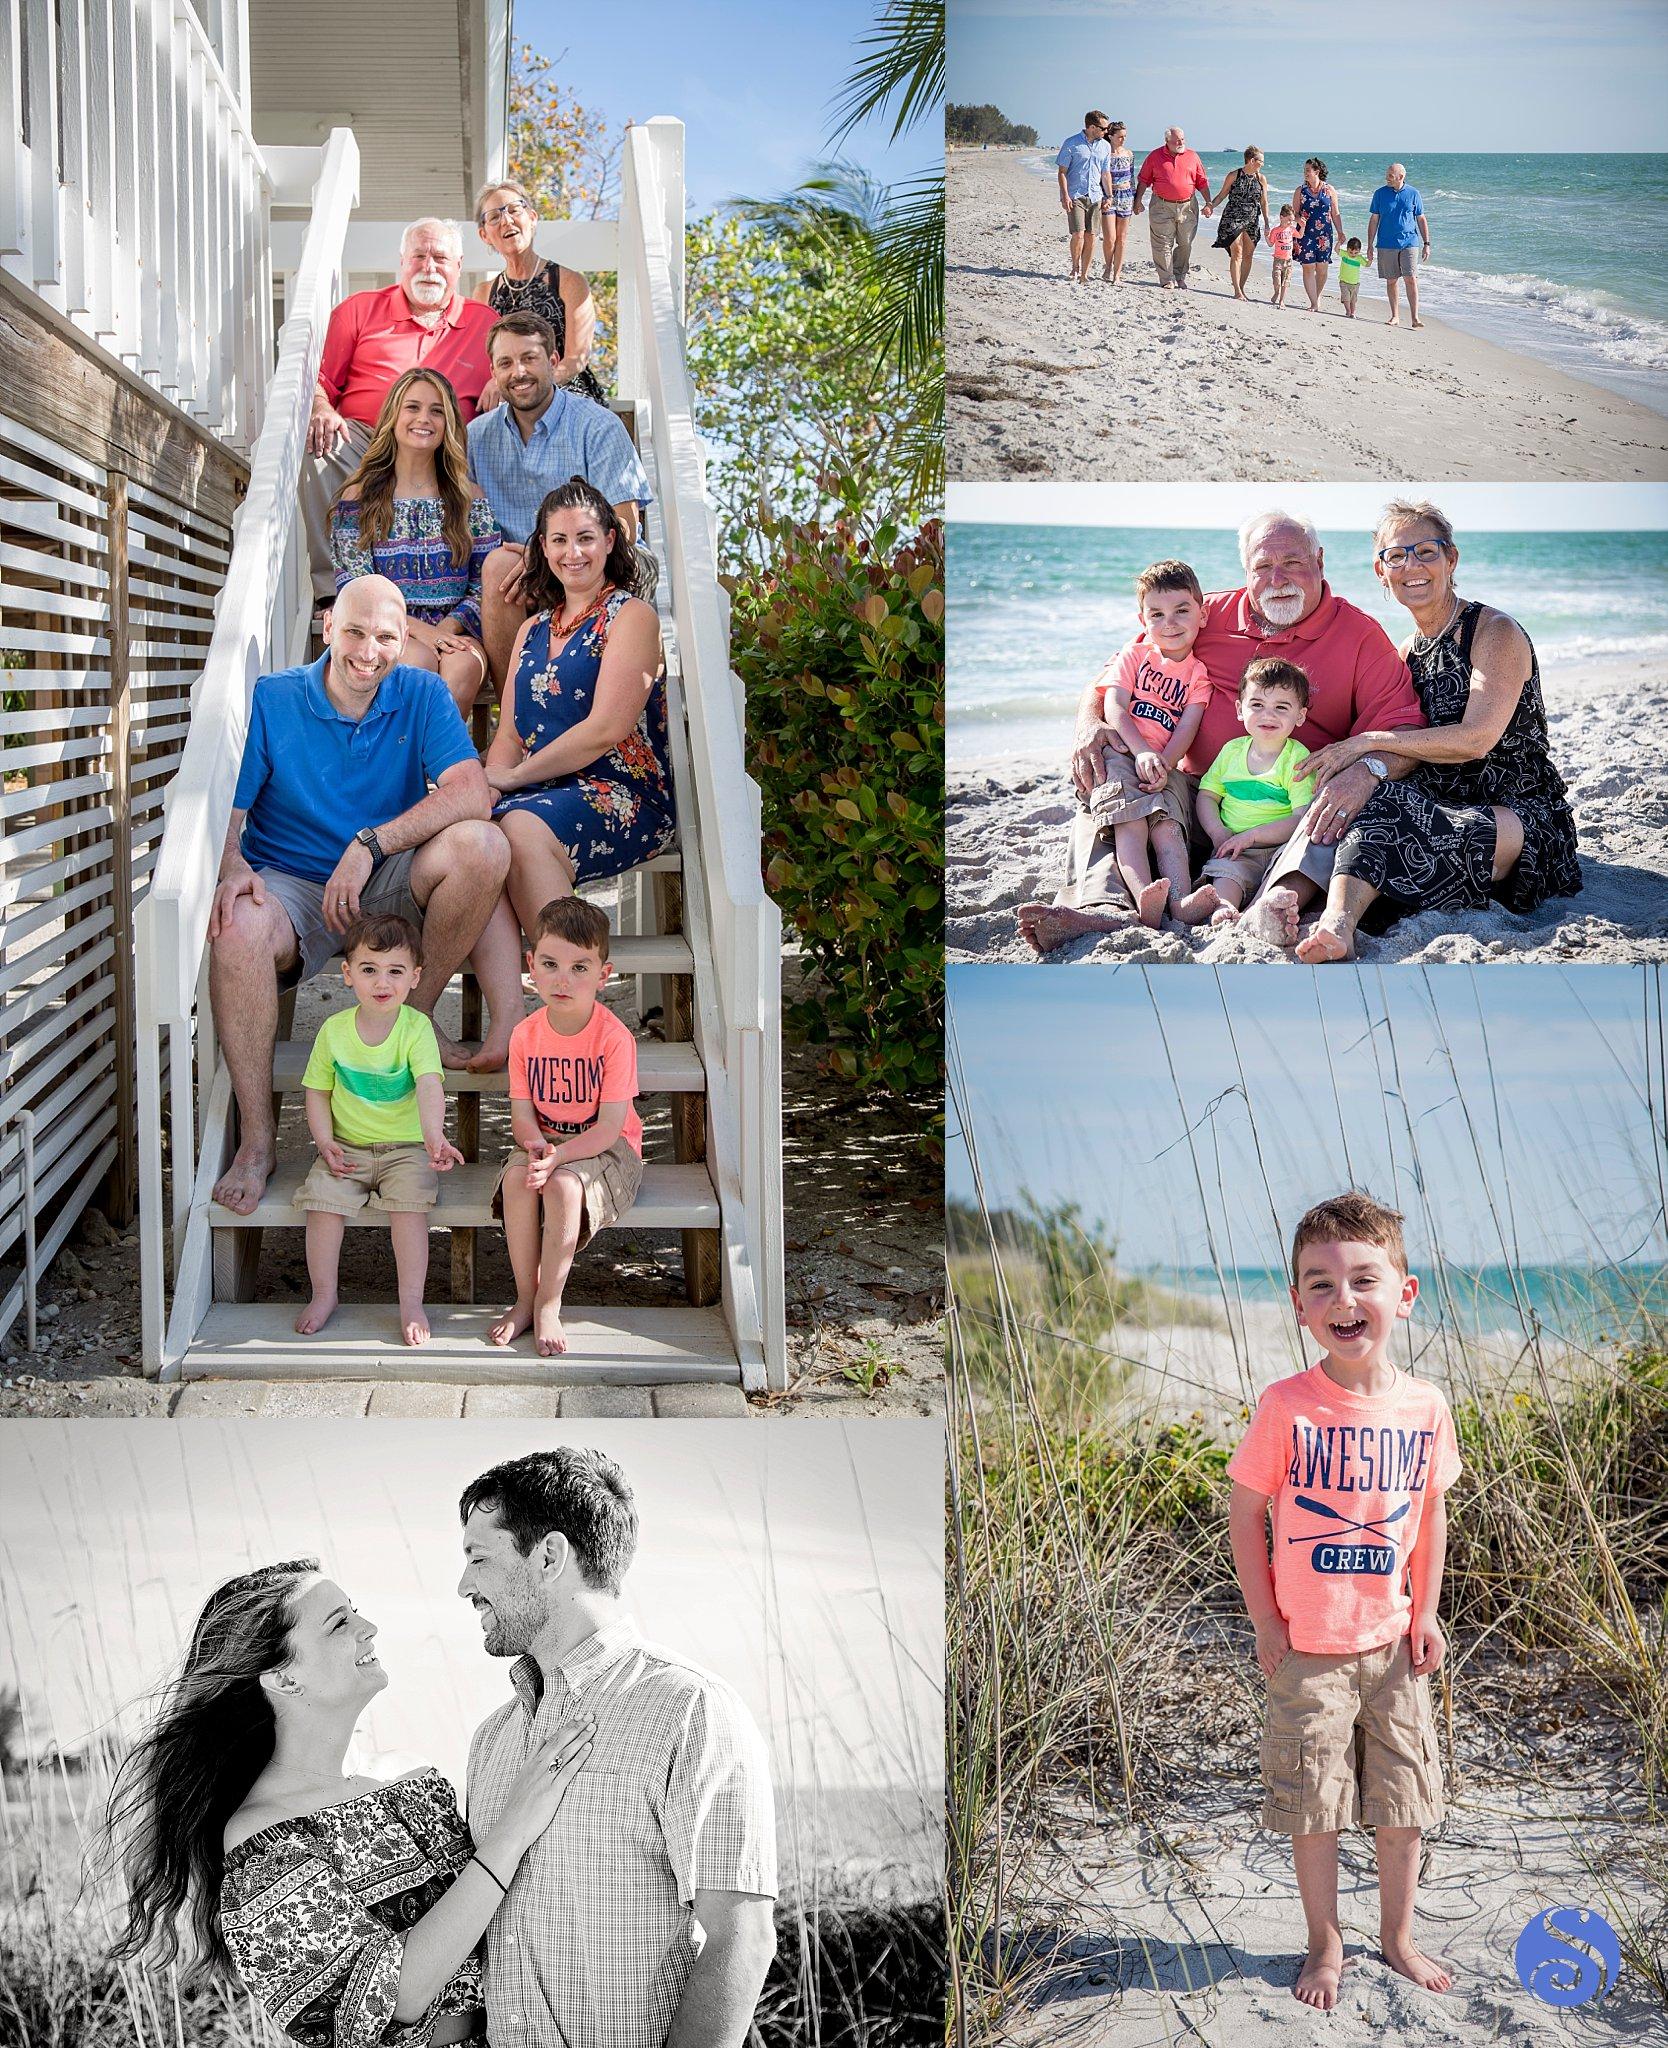 South Seas Island Resort Captiva Island Florida Family Beach Photography